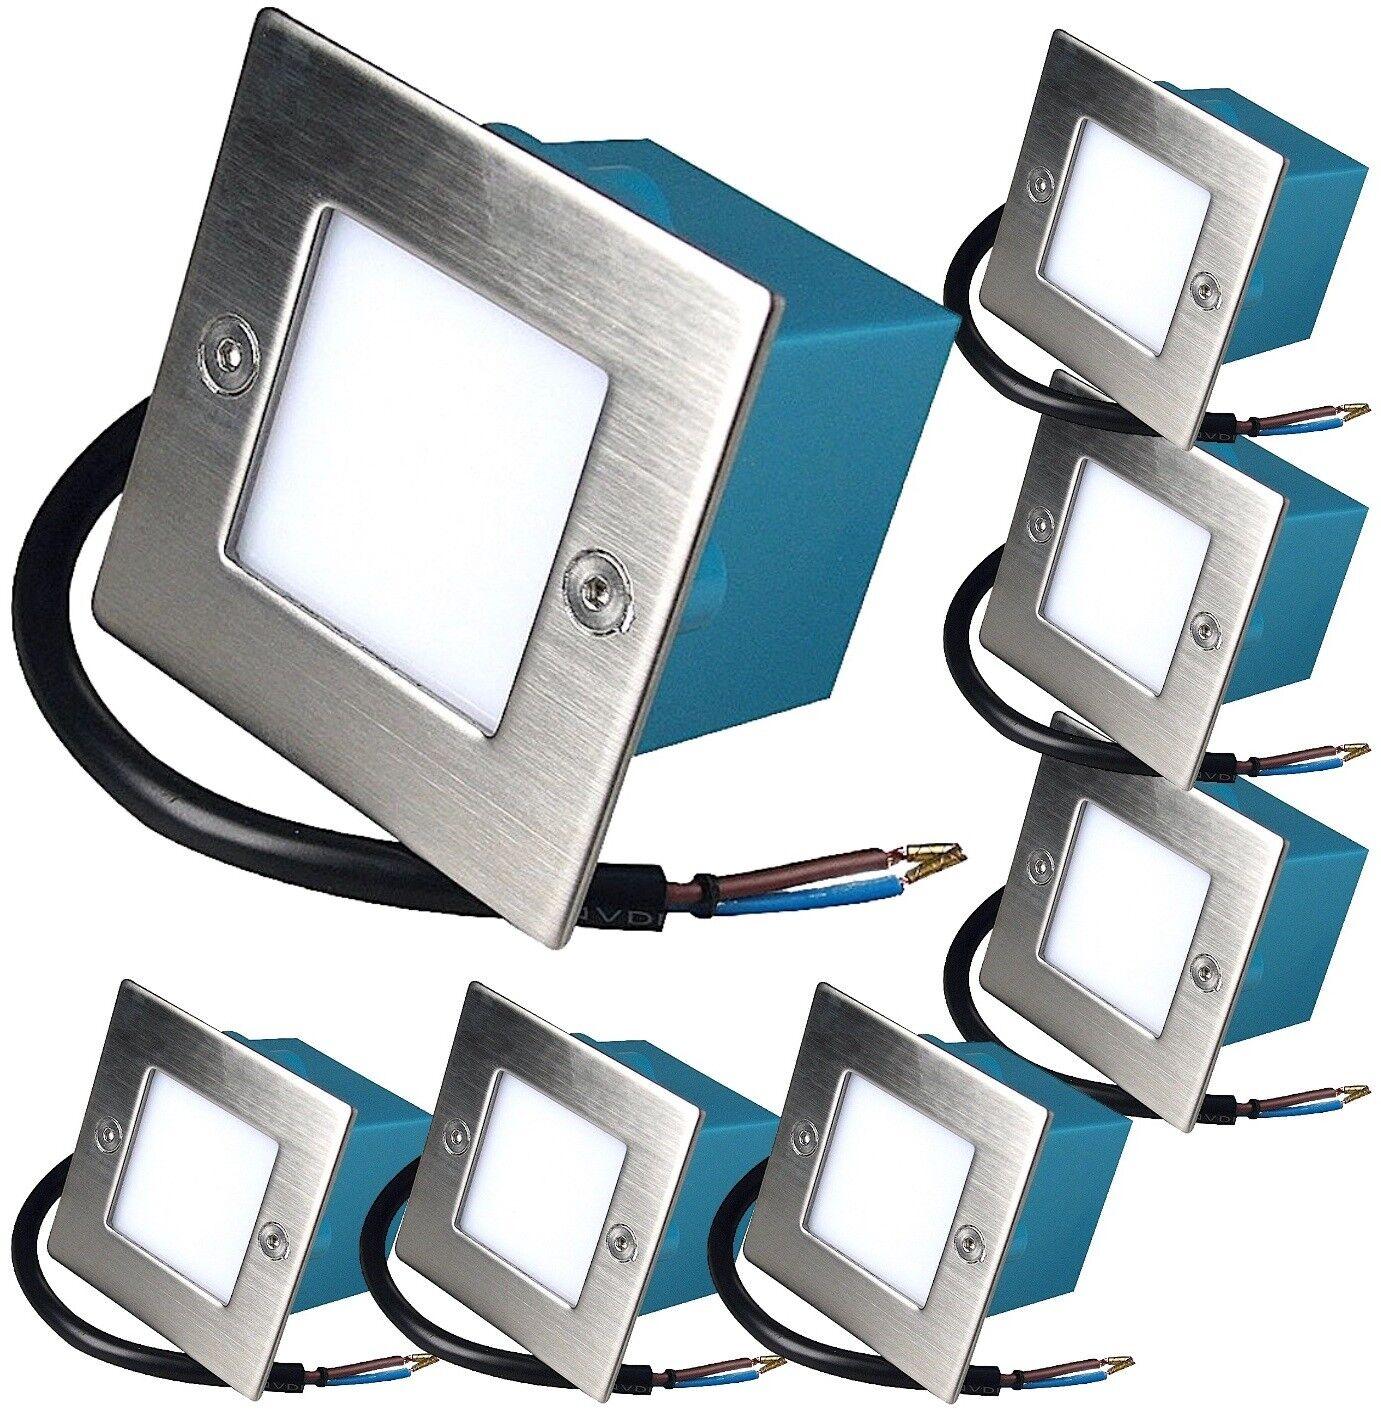 7 x LED Wand Einbaustrahler Treppen Leuchten LEON 230Volt IP54 Wandleuchten 1,5W